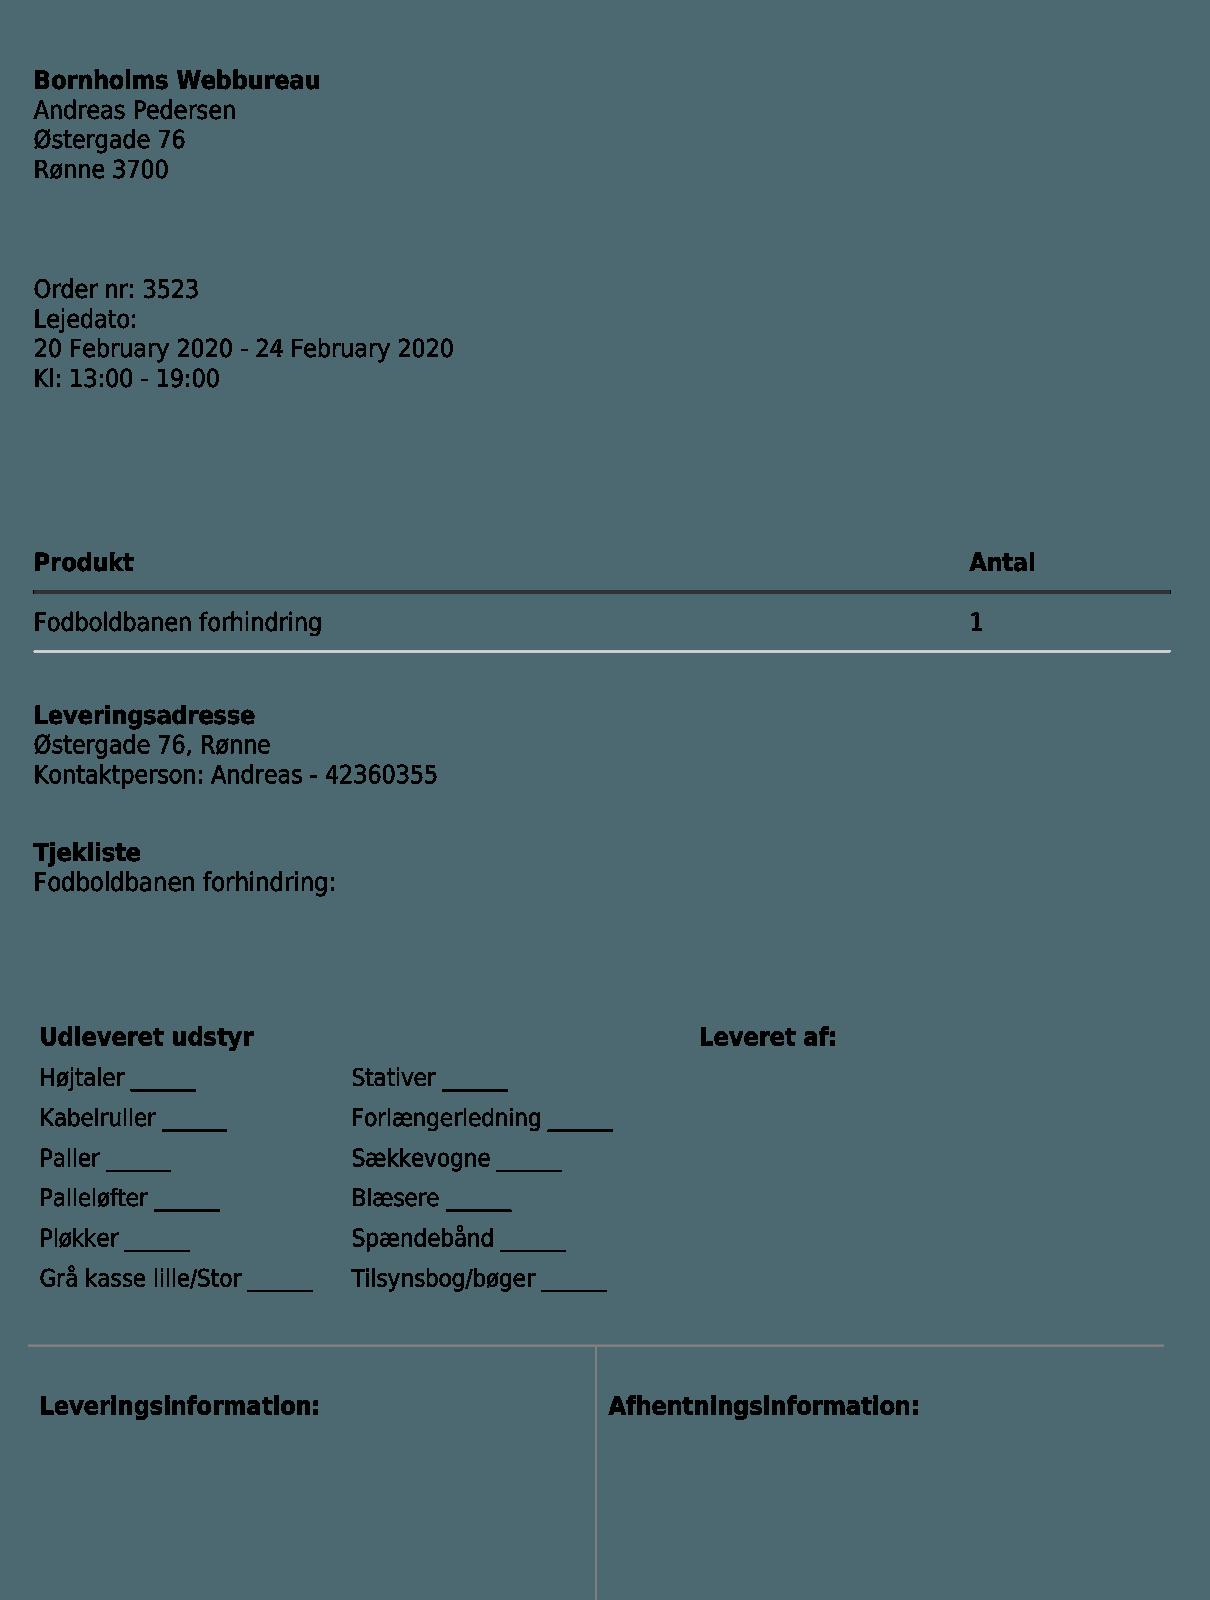 eksempel-af-koereseddel